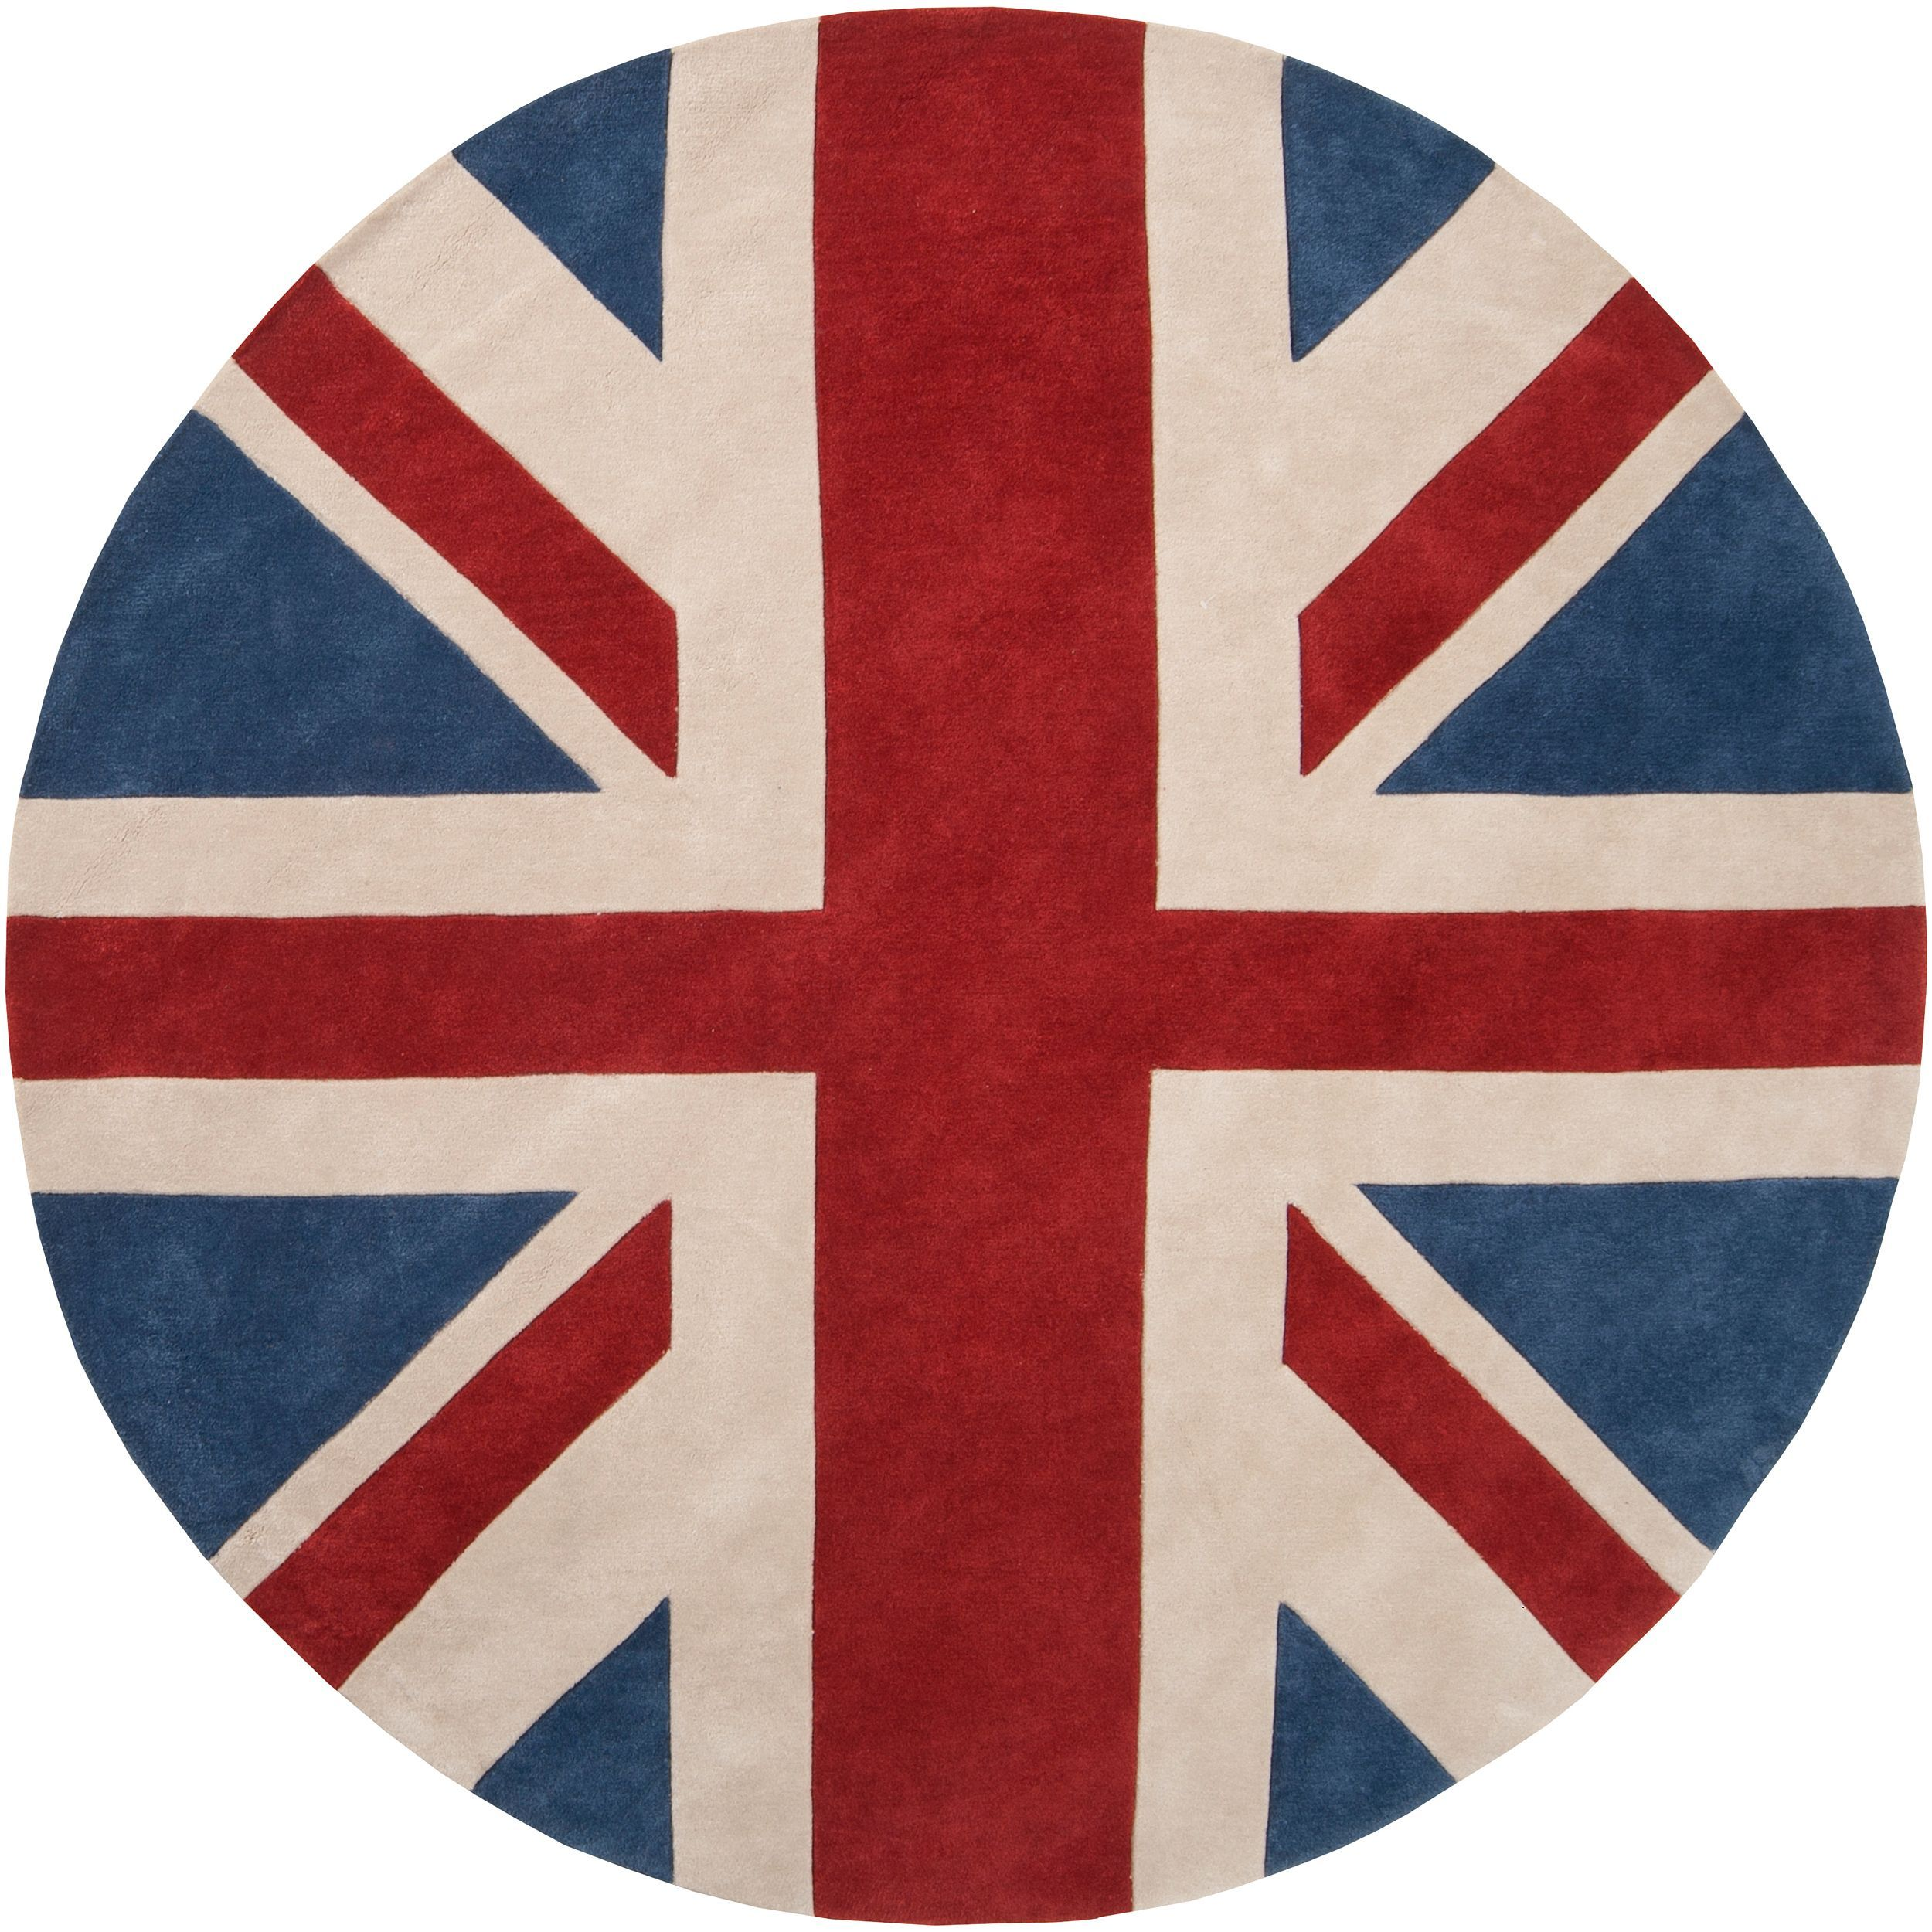 Handtufted Red Hillsborough East Union Jack Rug (8' Round